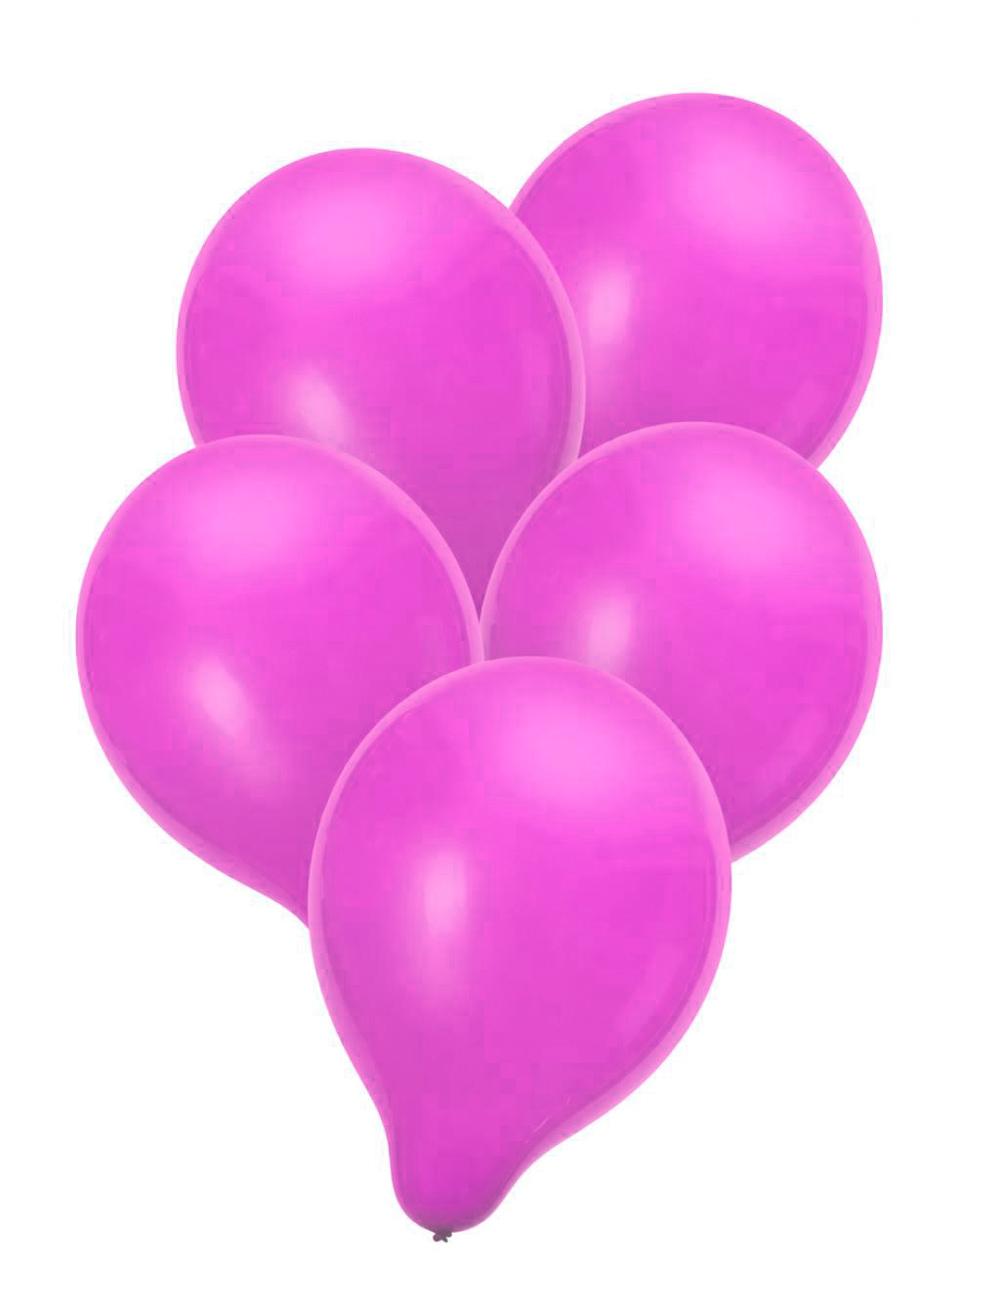 Luftballons pink 50 Stk.